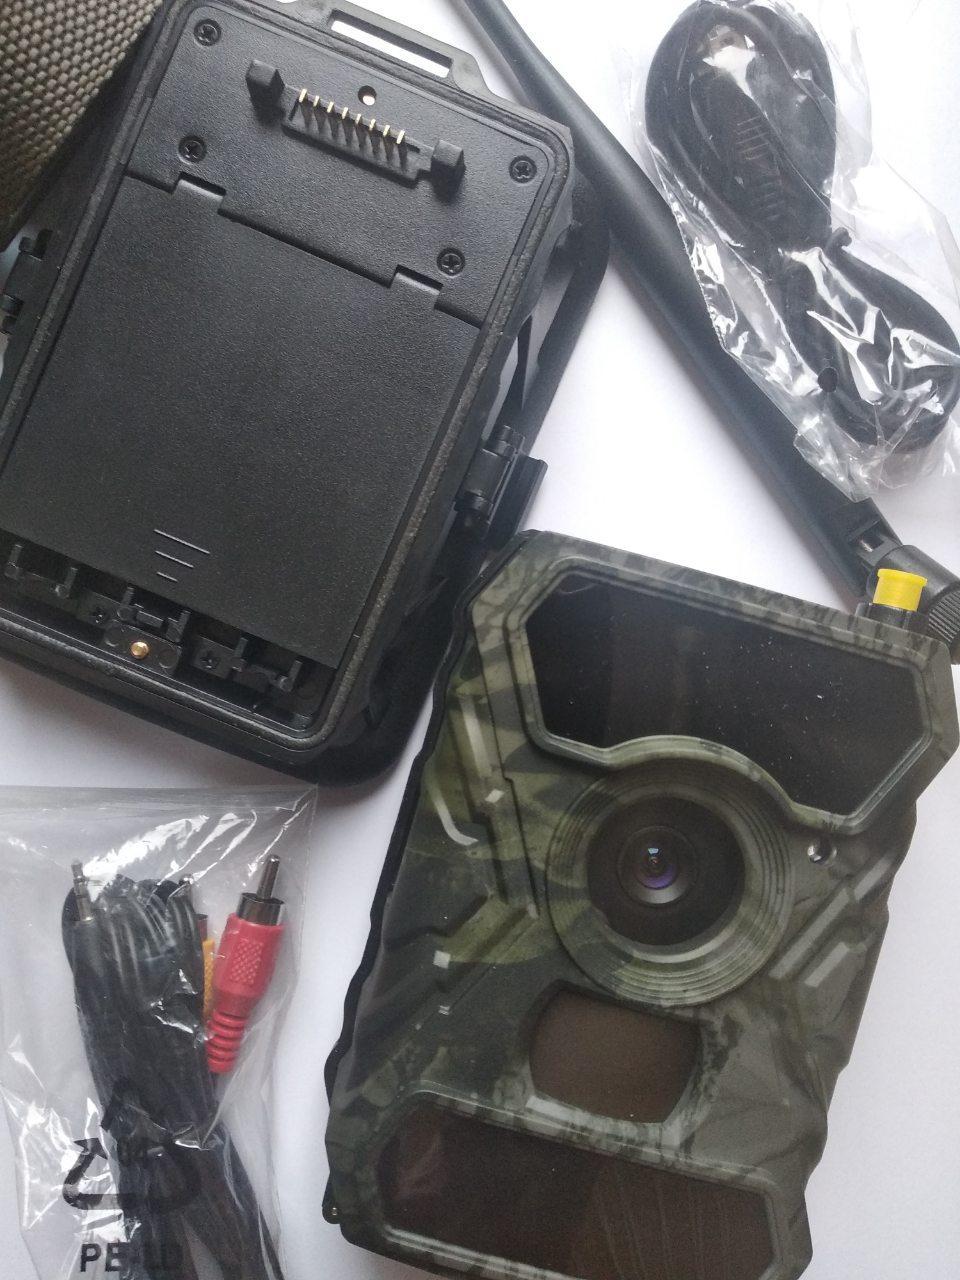 Охотничья камера фотоловушка Scouting trail camera 3g